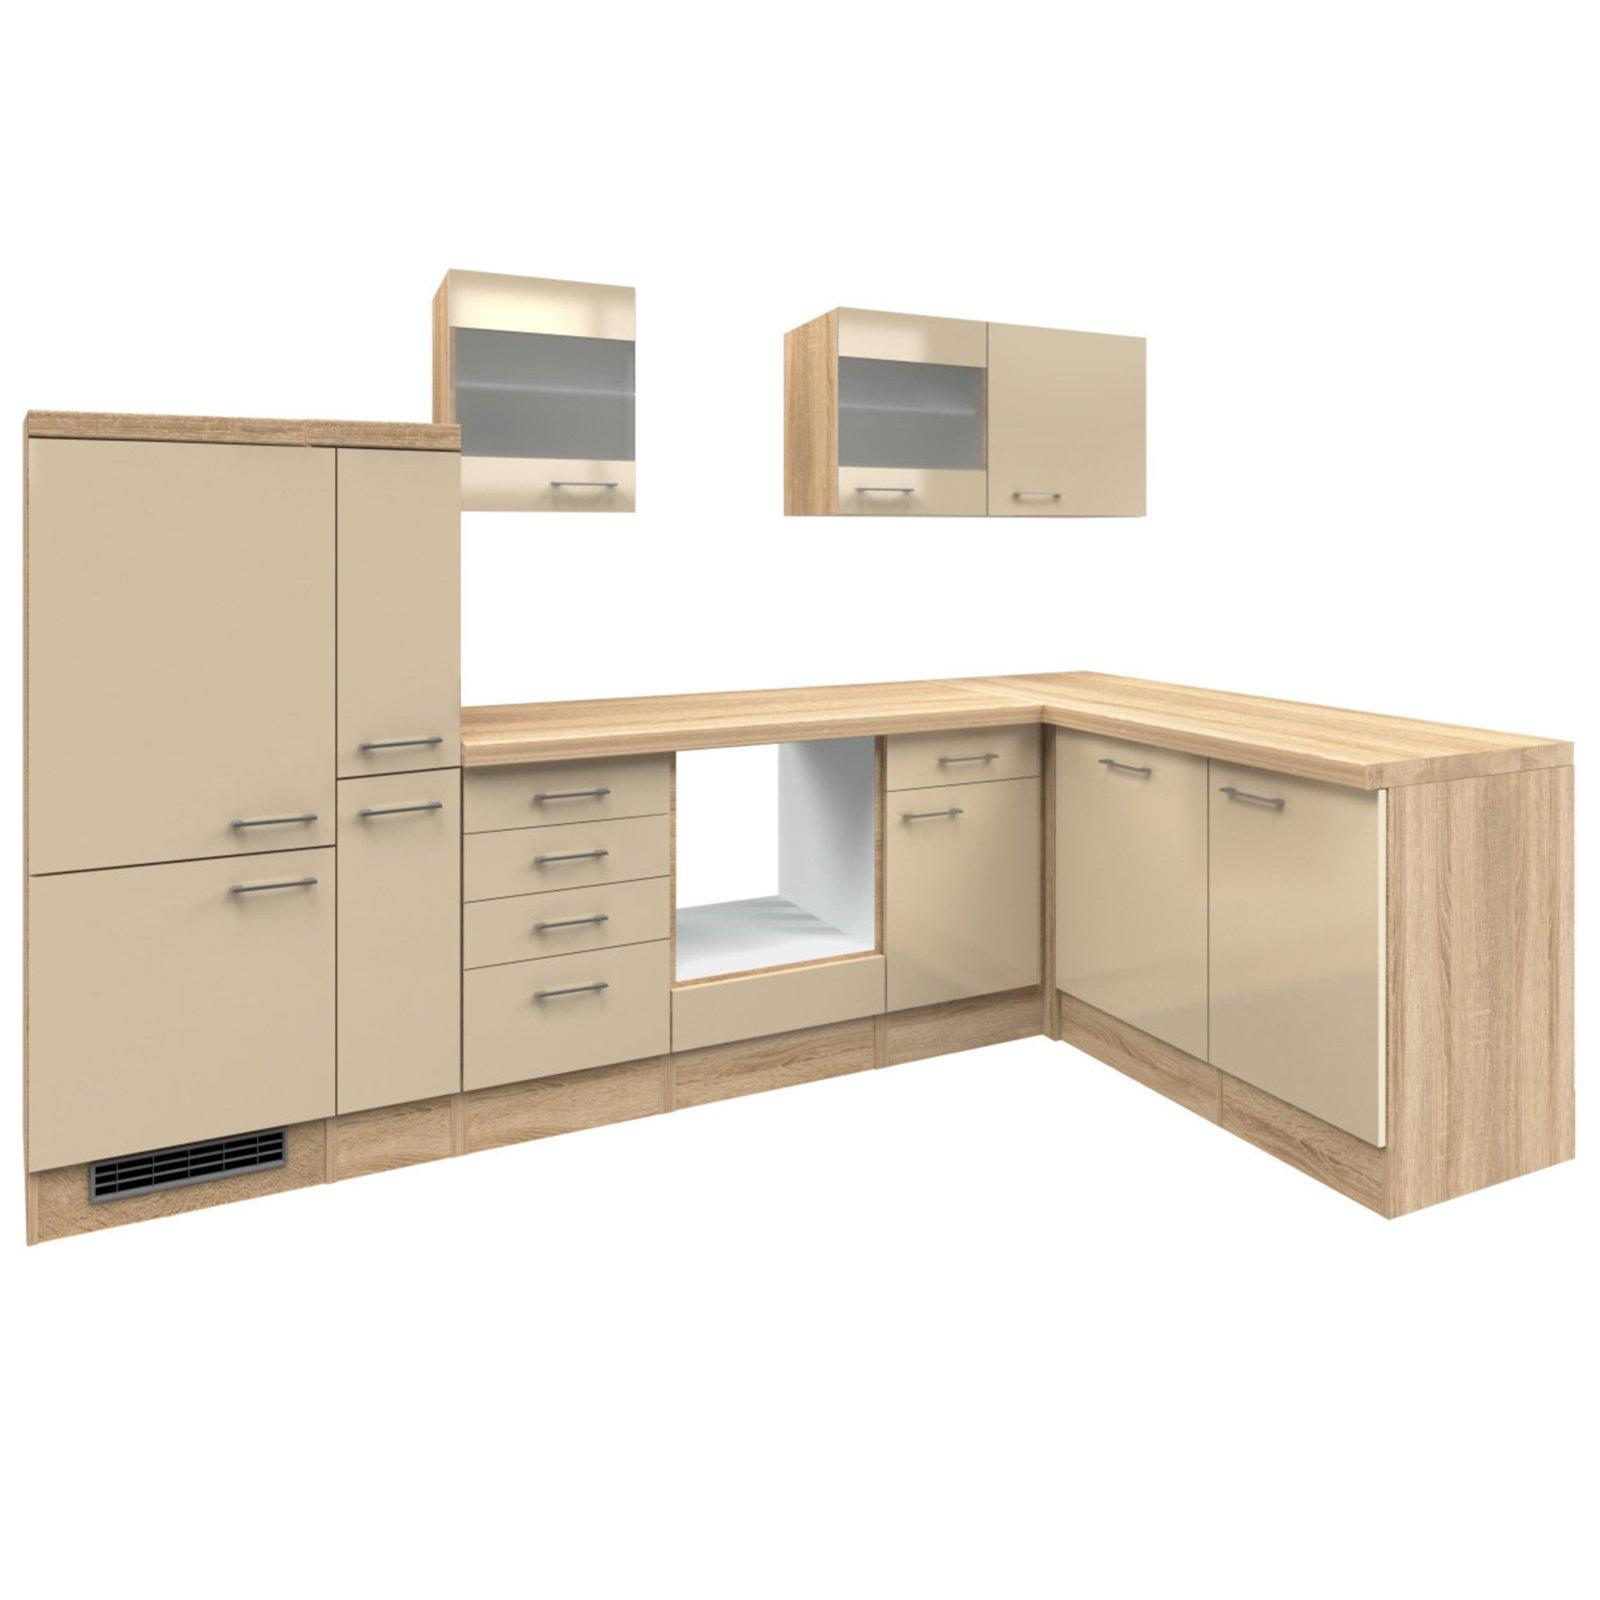 winkelk che nepal kaschmir glanz sonoma eiche 310x170. Black Bedroom Furniture Sets. Home Design Ideas